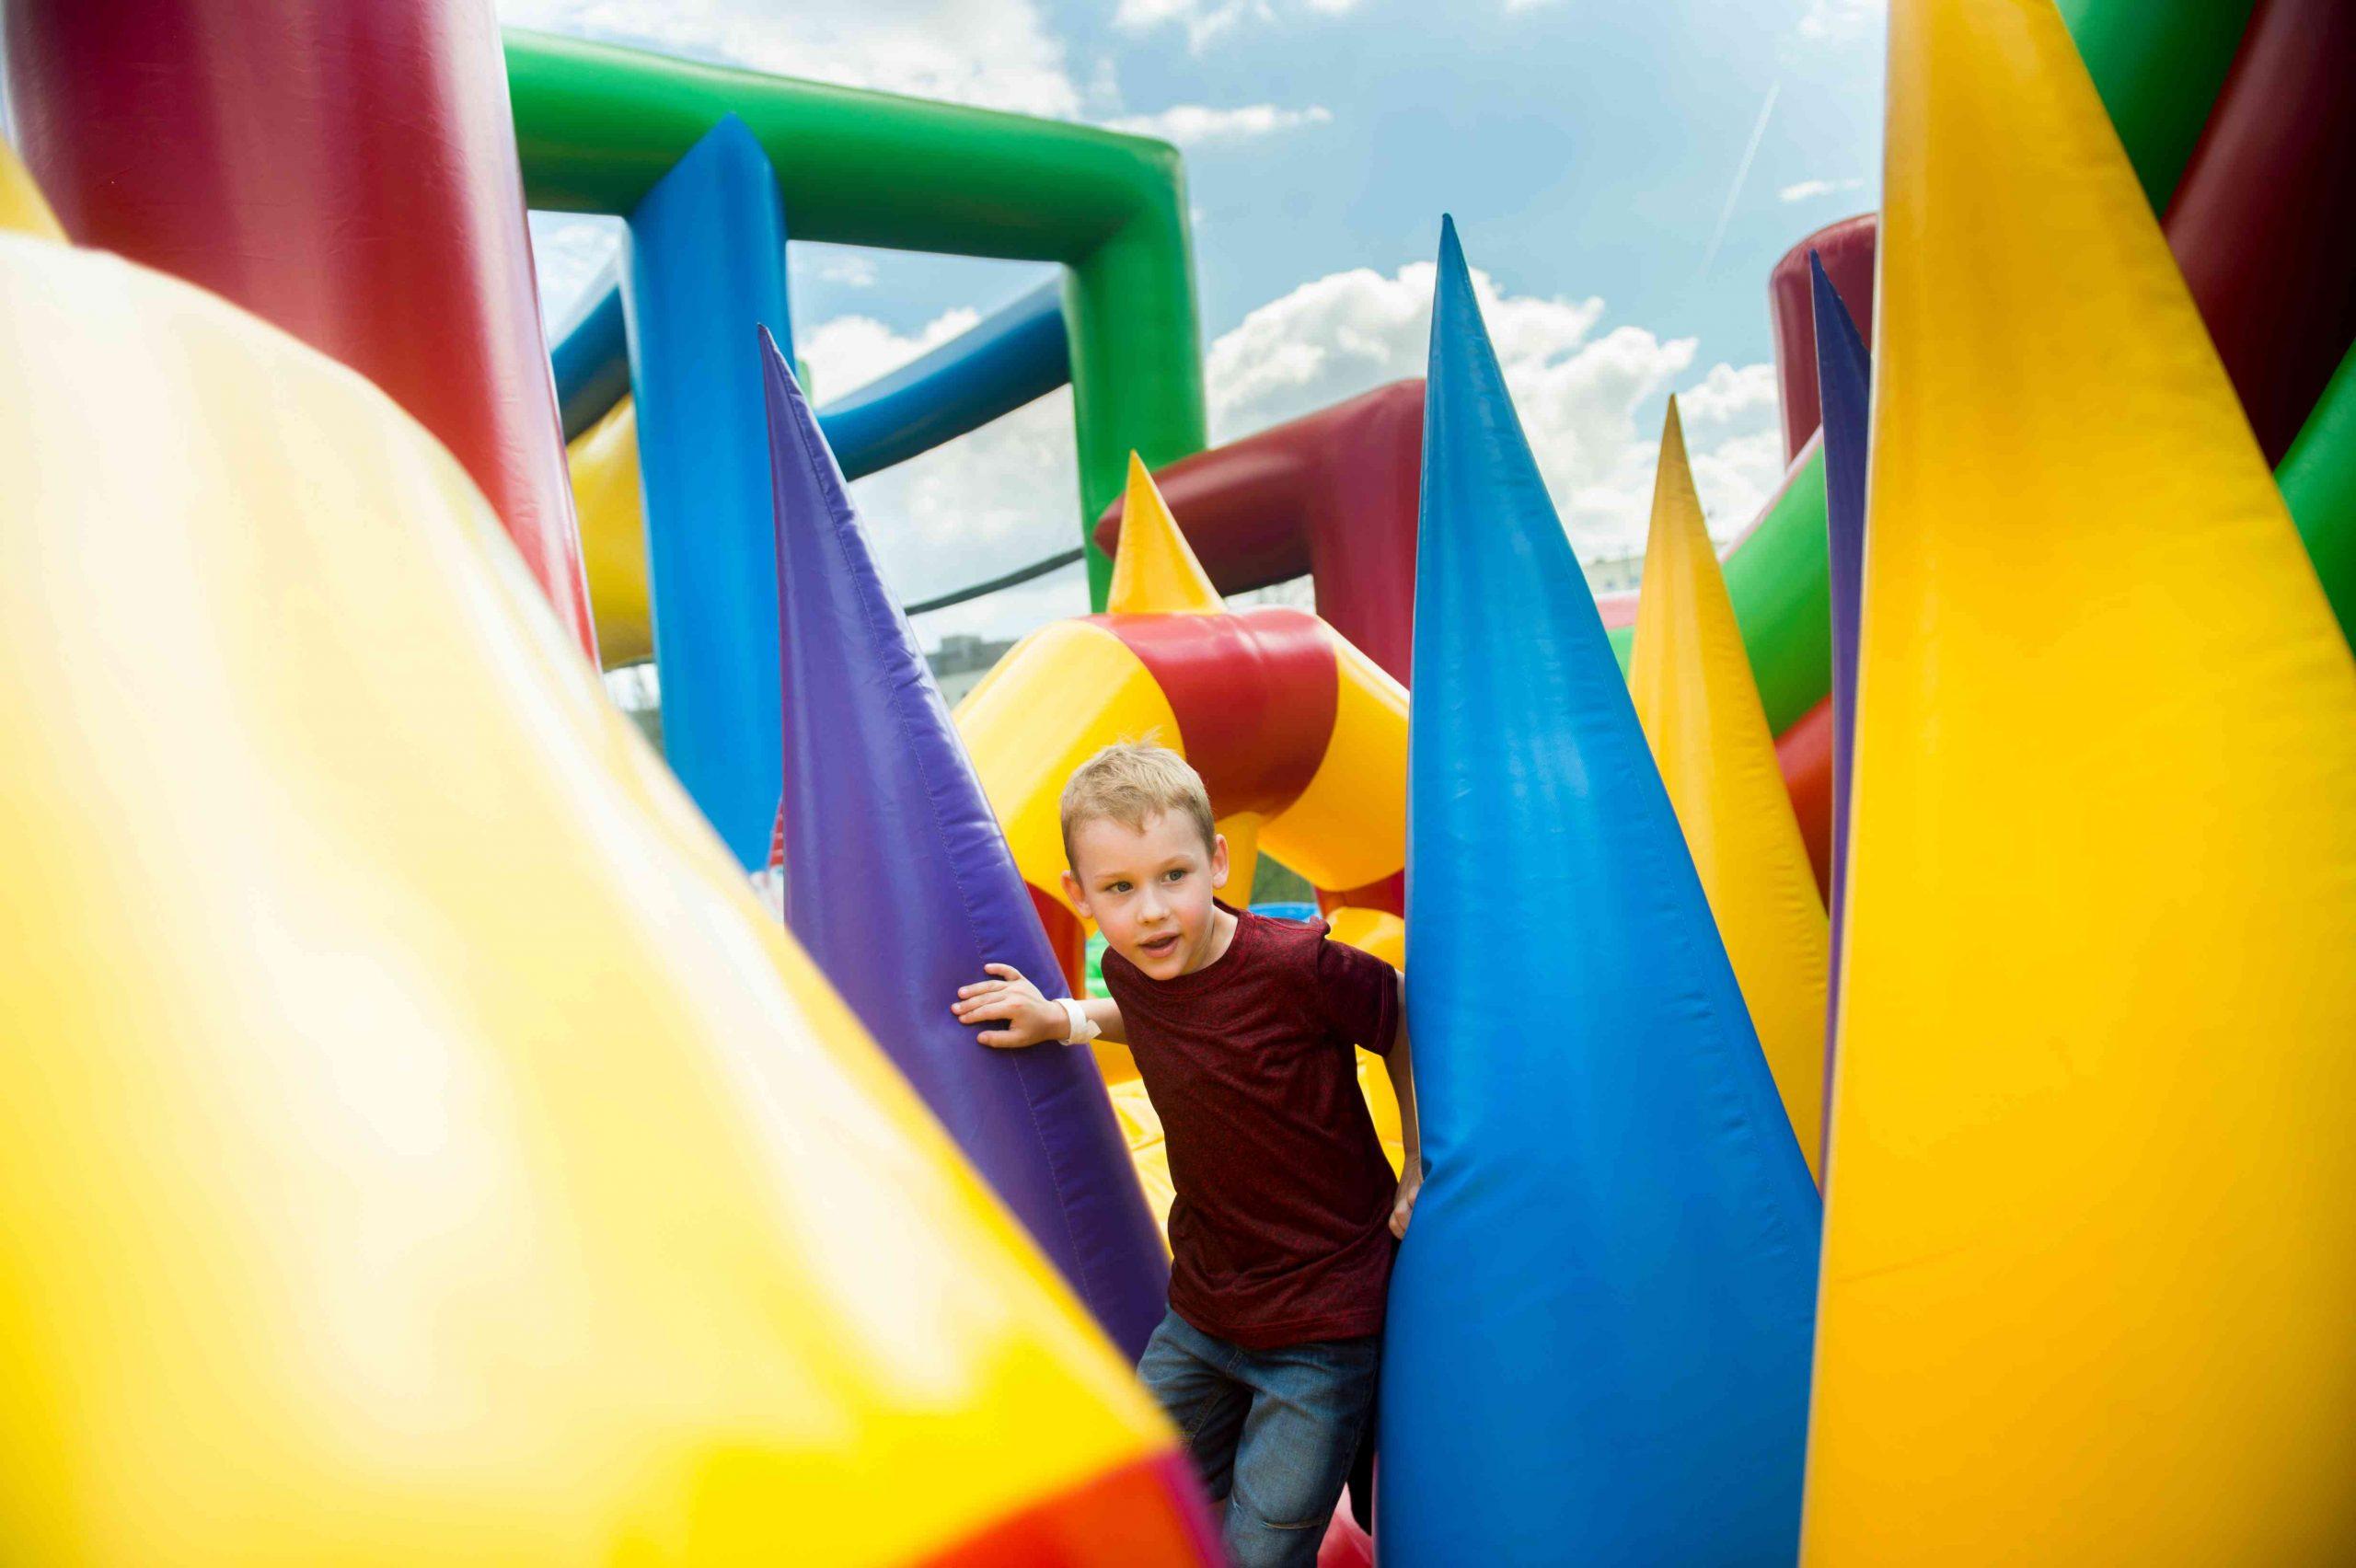 Inflatable Fun Zone photo